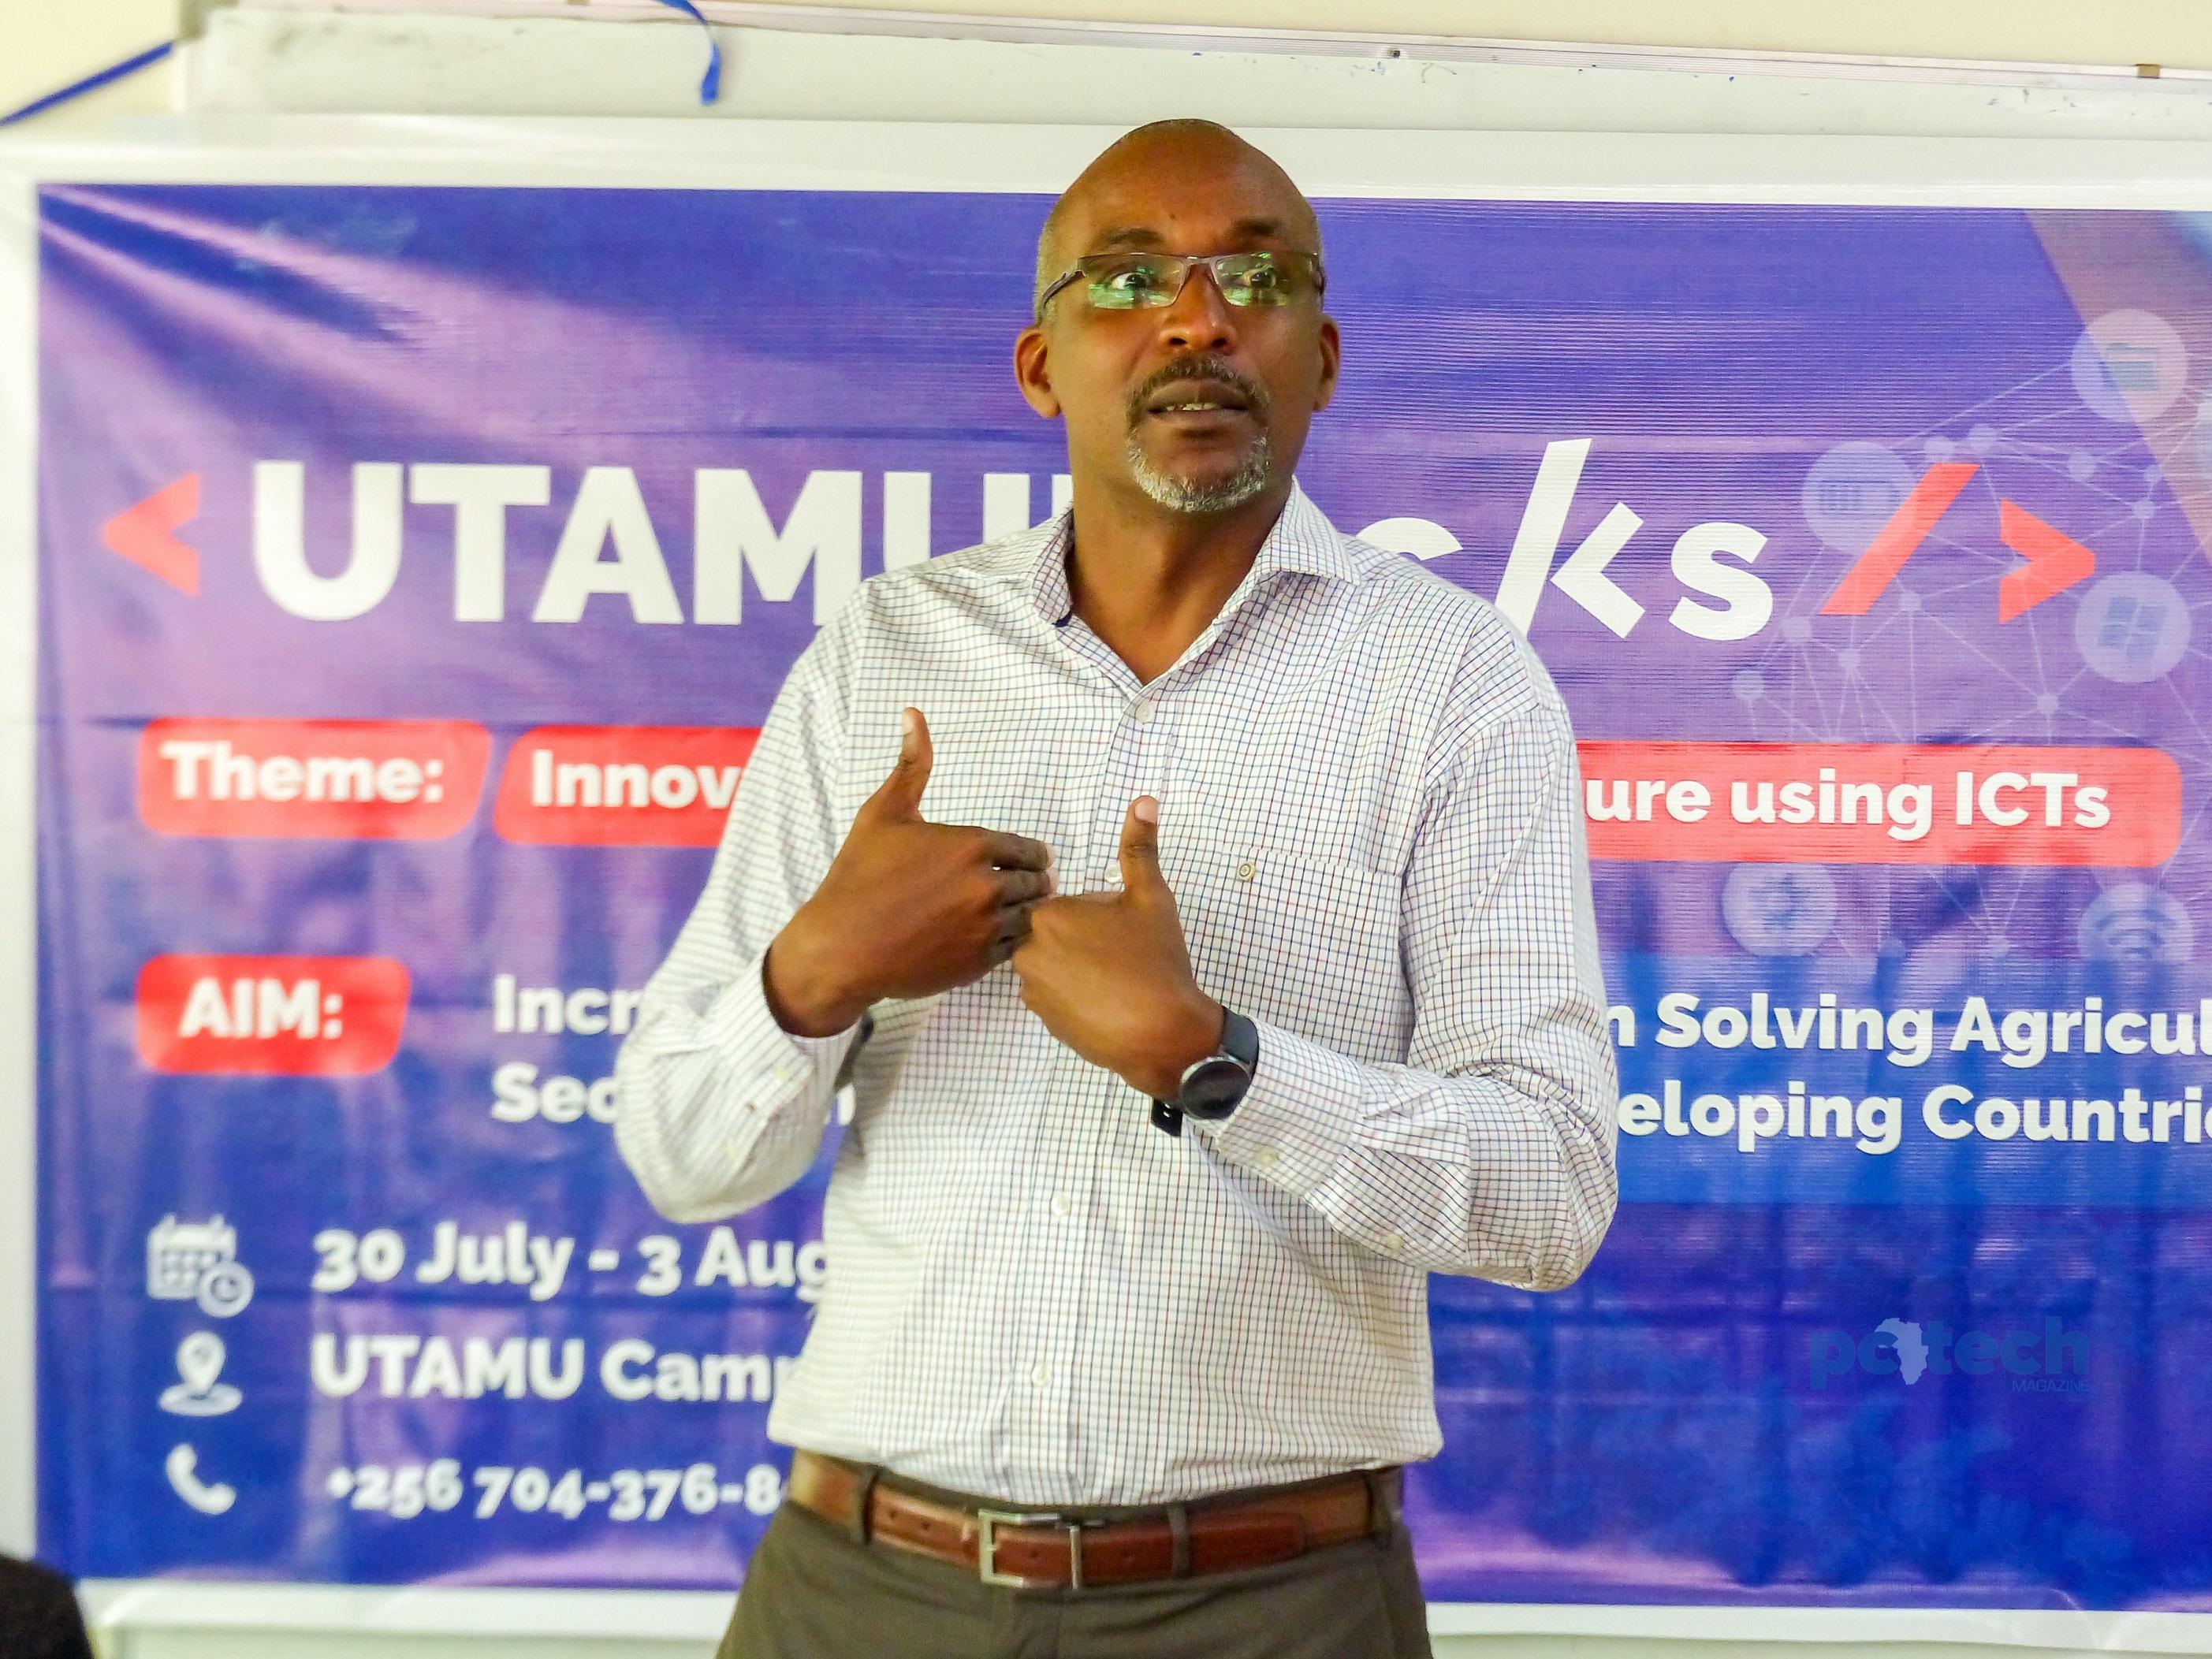 Prof. Jude Lubega briefs media about the UTAMU Agriculture Hackathon at the UTAMU head campus in Bugolobi on Monday 30th, July 2018.